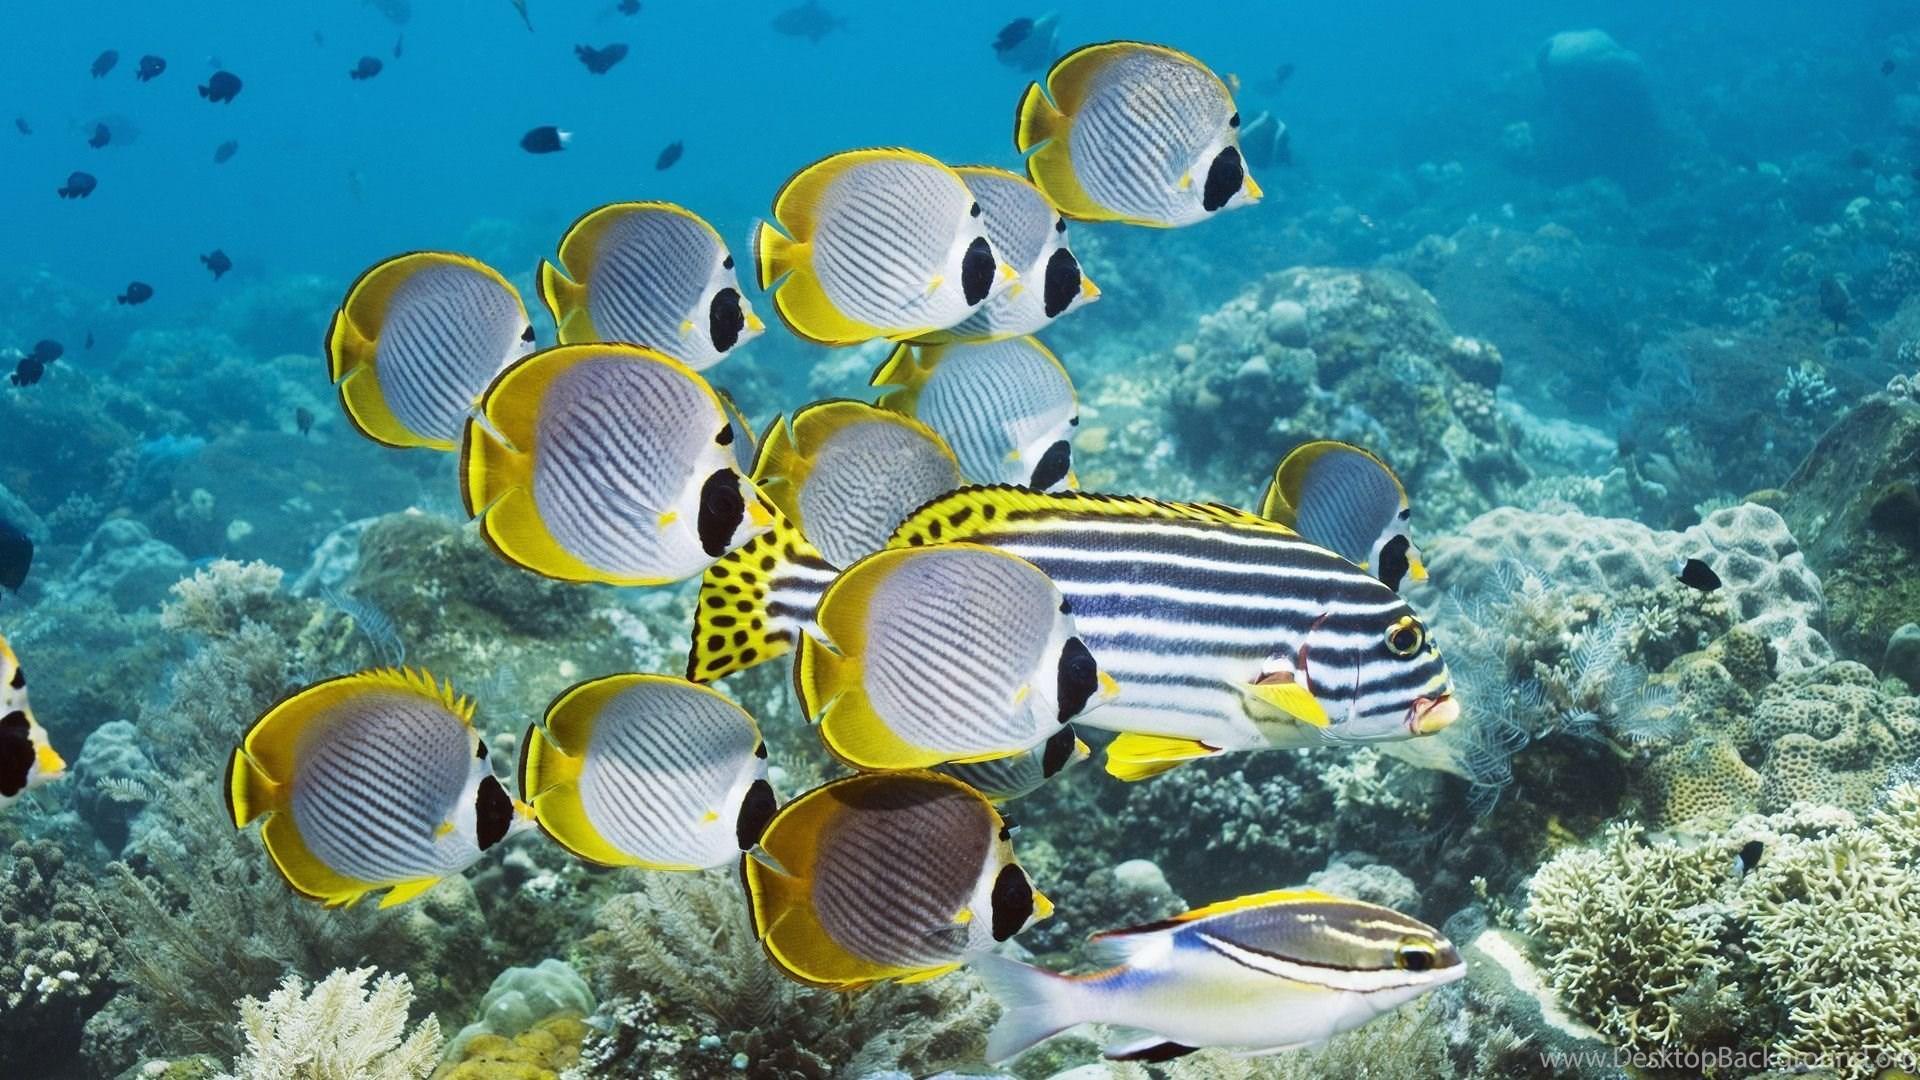 Wallpapers Underwater Fish Coral Butterflyfish Desktop